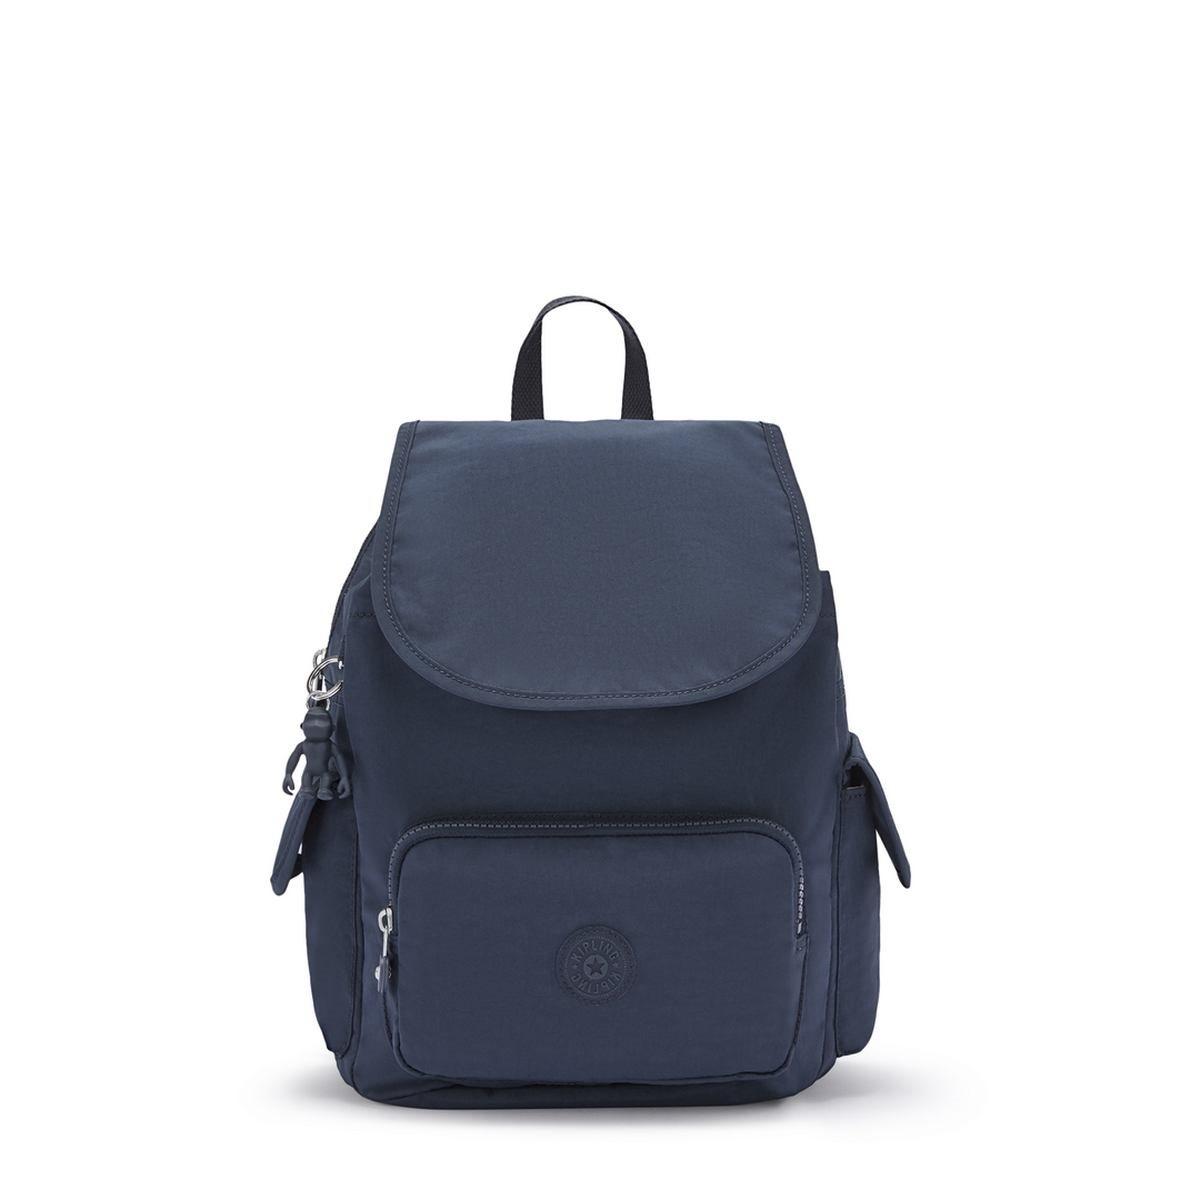 Kipling Τσάντα πλάτης 33.5x27x19cm City Packs S Fresh Blue